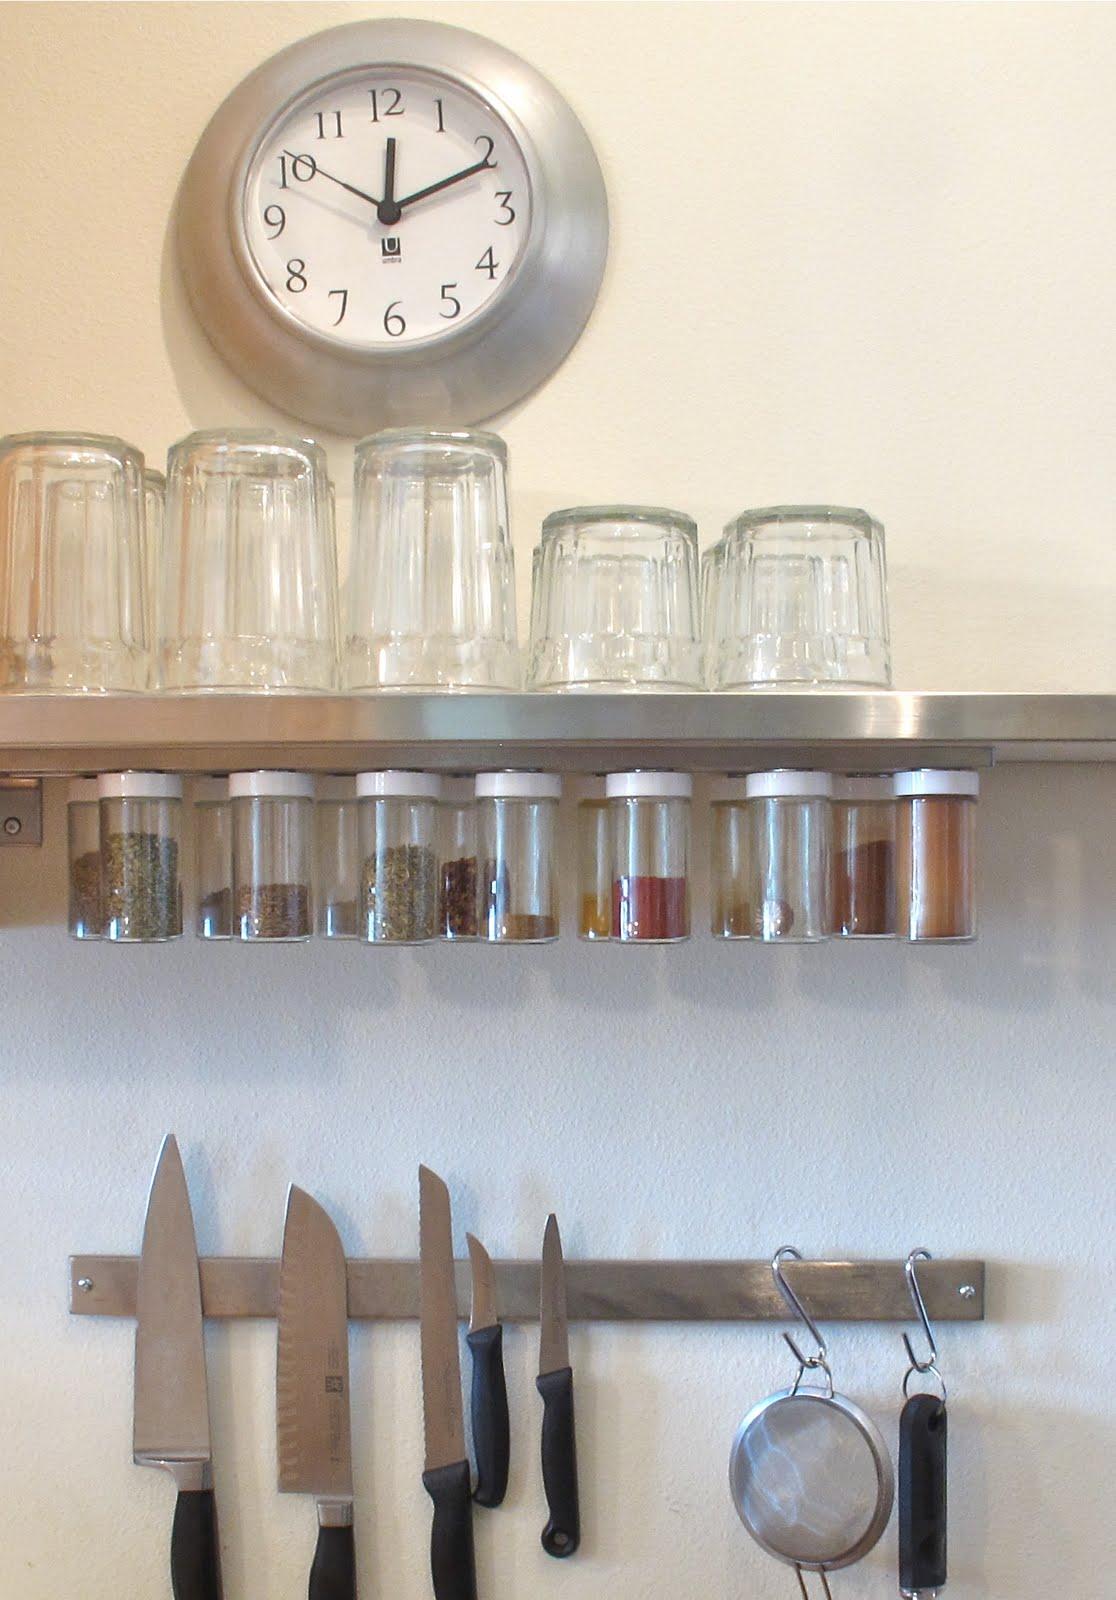 Magnetic spice racks for kitchen - Diy Hanging Magnetic Spice Rack Storage